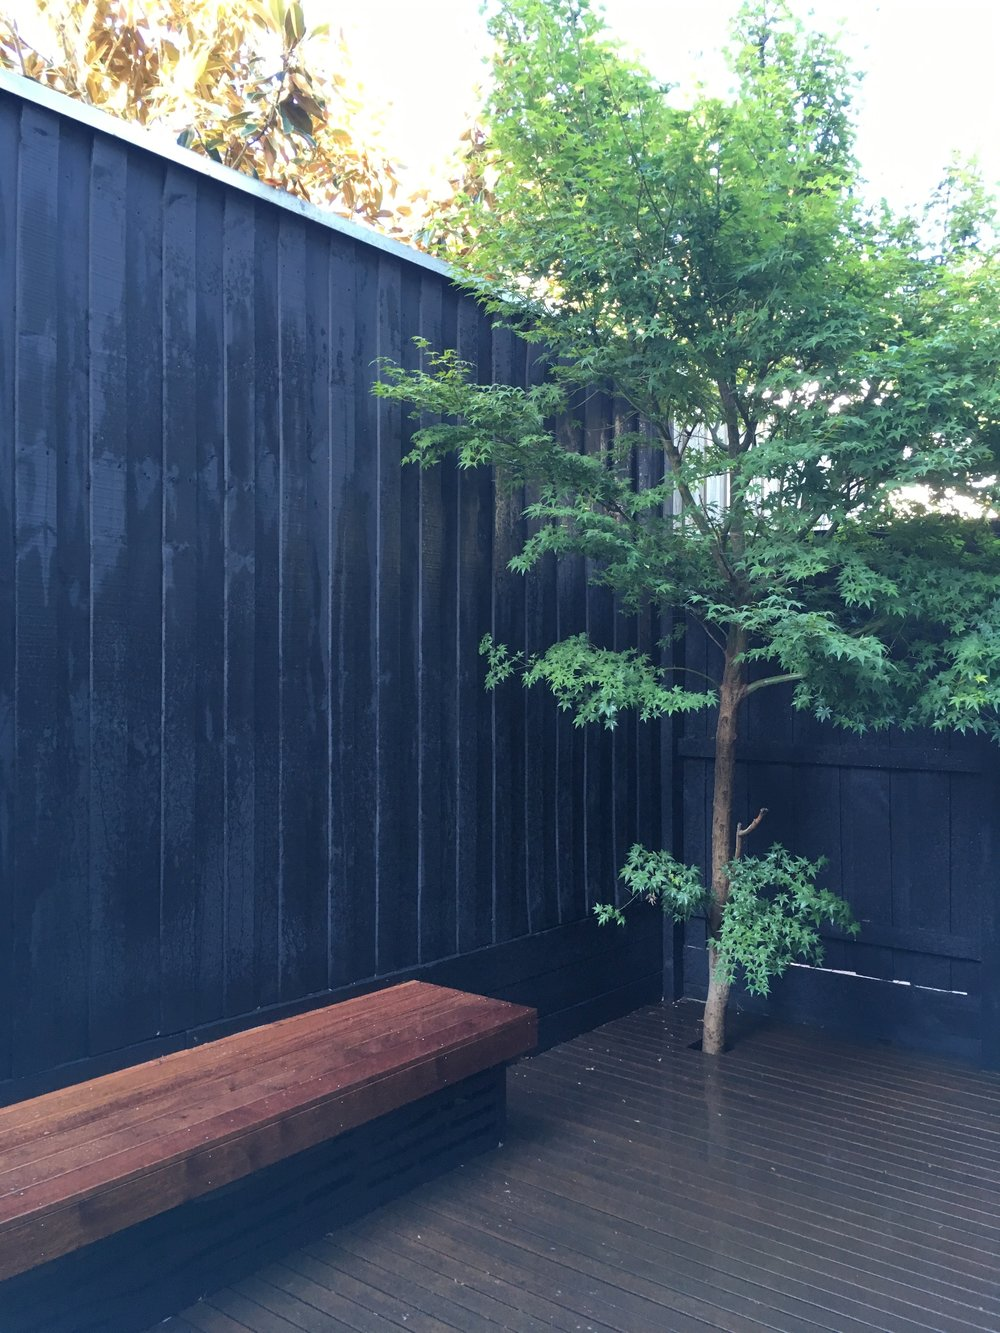 Elwood Courtyard. Merbau Decking. Japanese Maple.